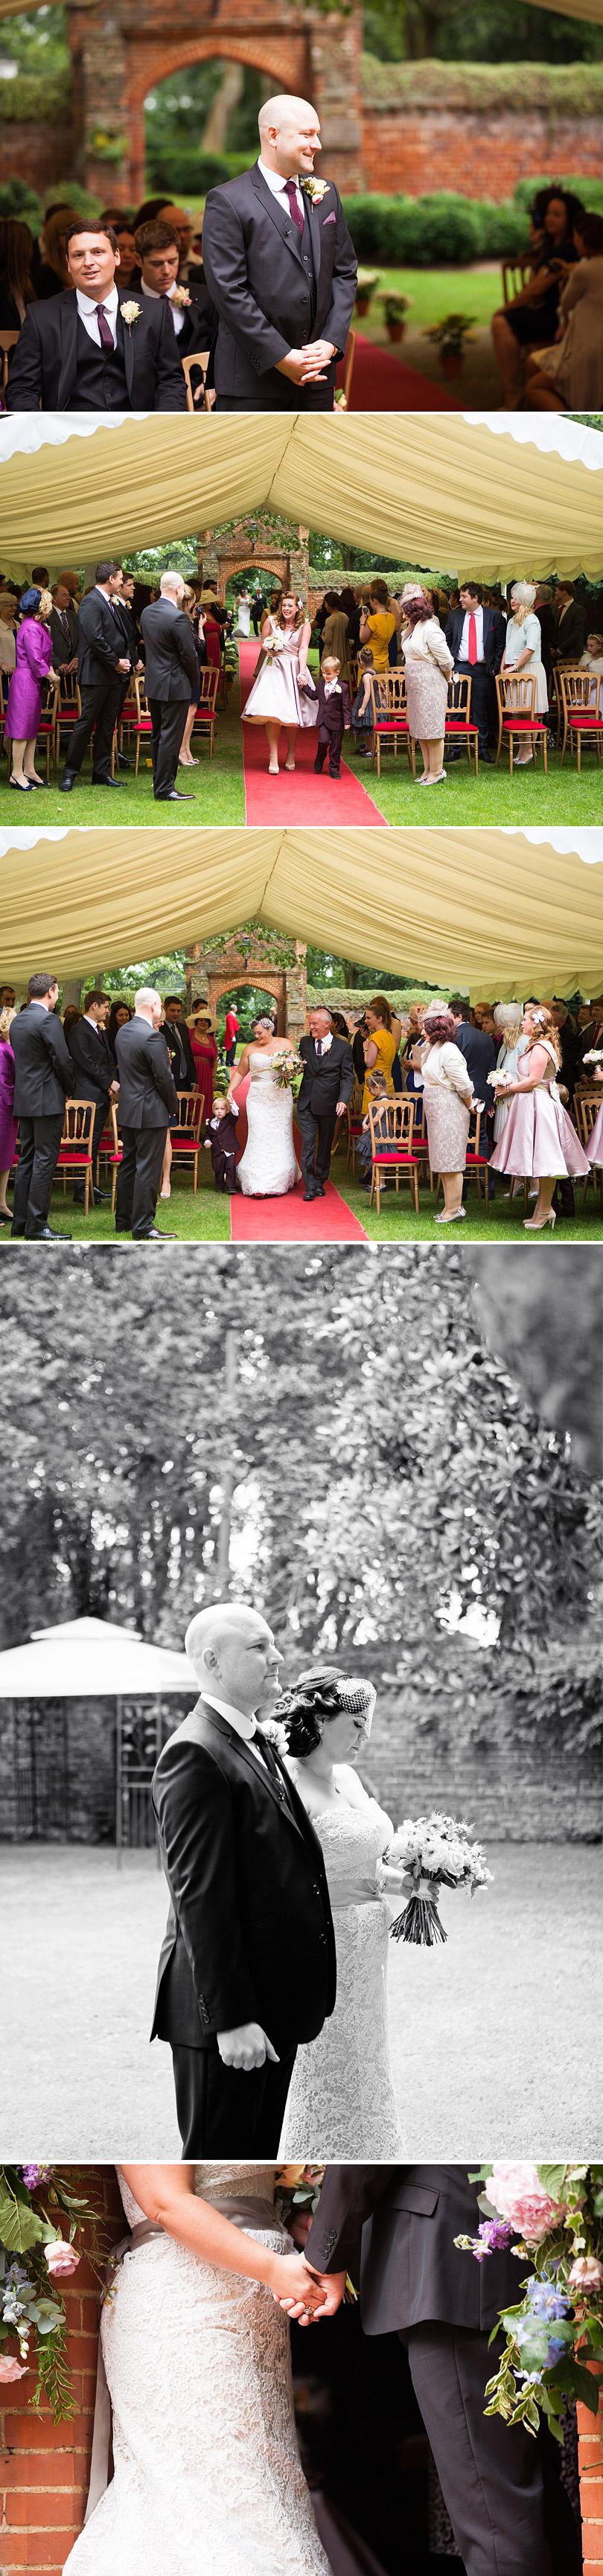 Creeksea-Place-Wedding-14.jpg